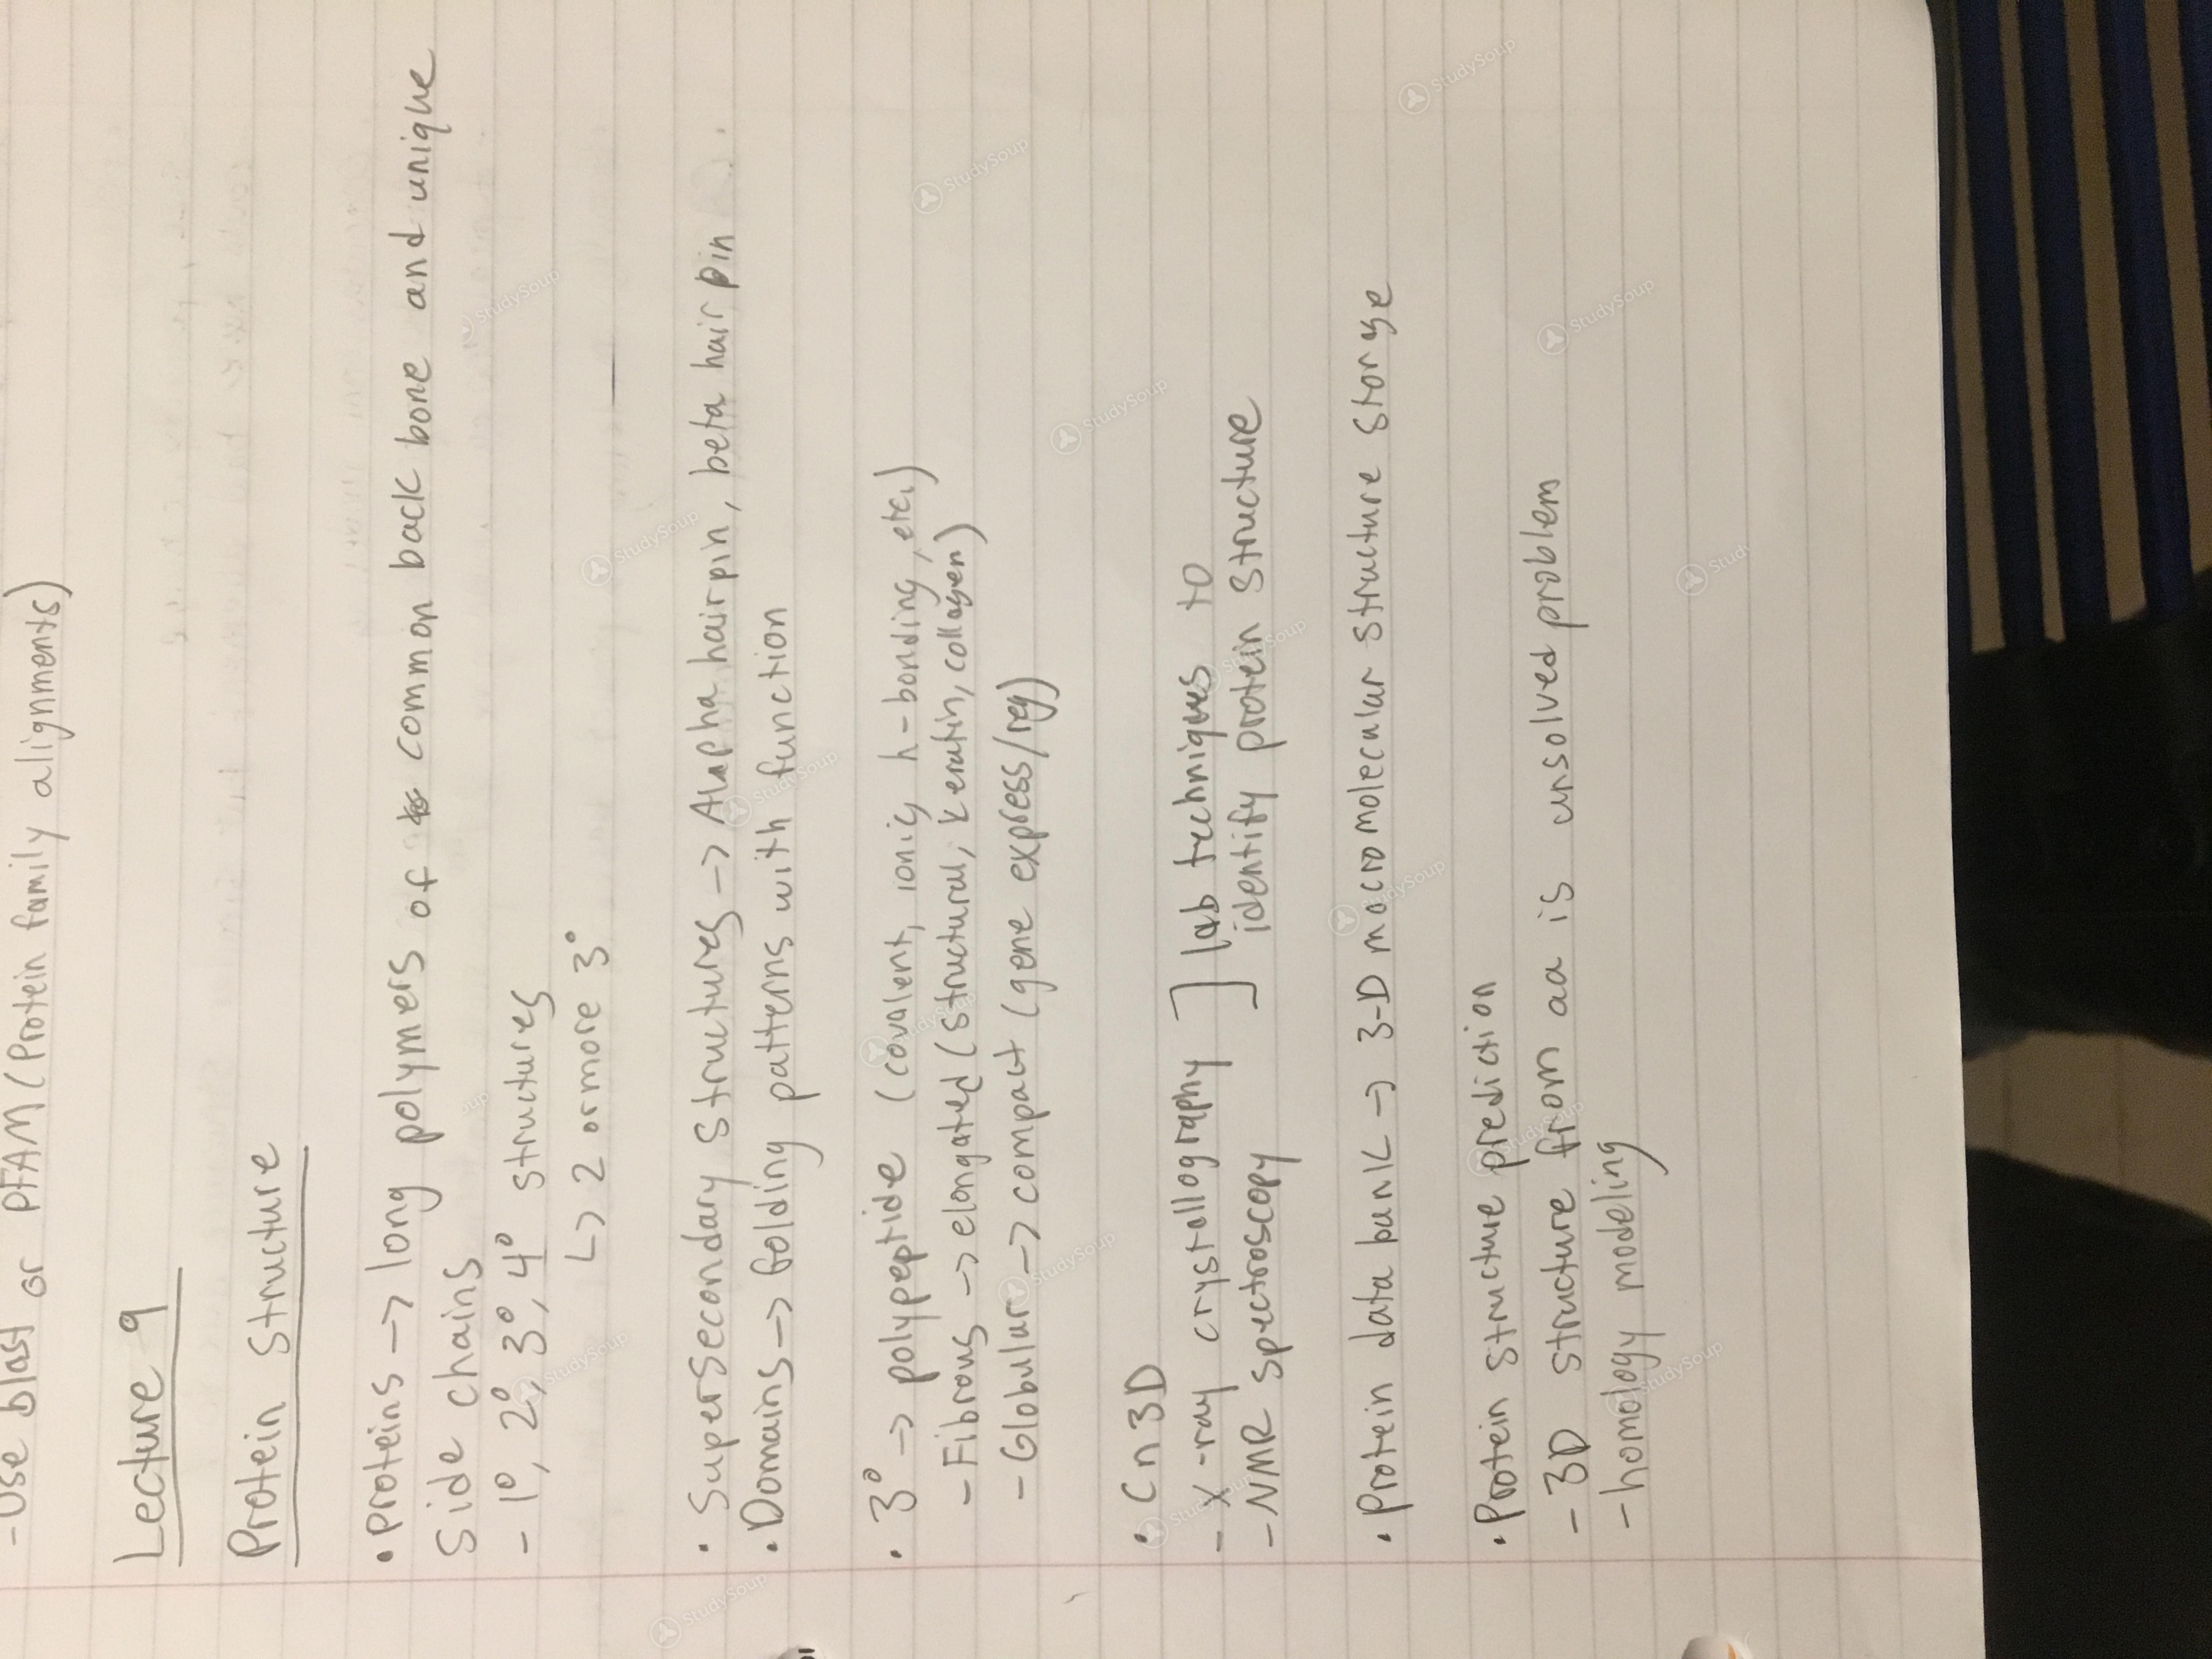 Towson - MBBB 301 - Class Notes - Week 11 | StudySoup